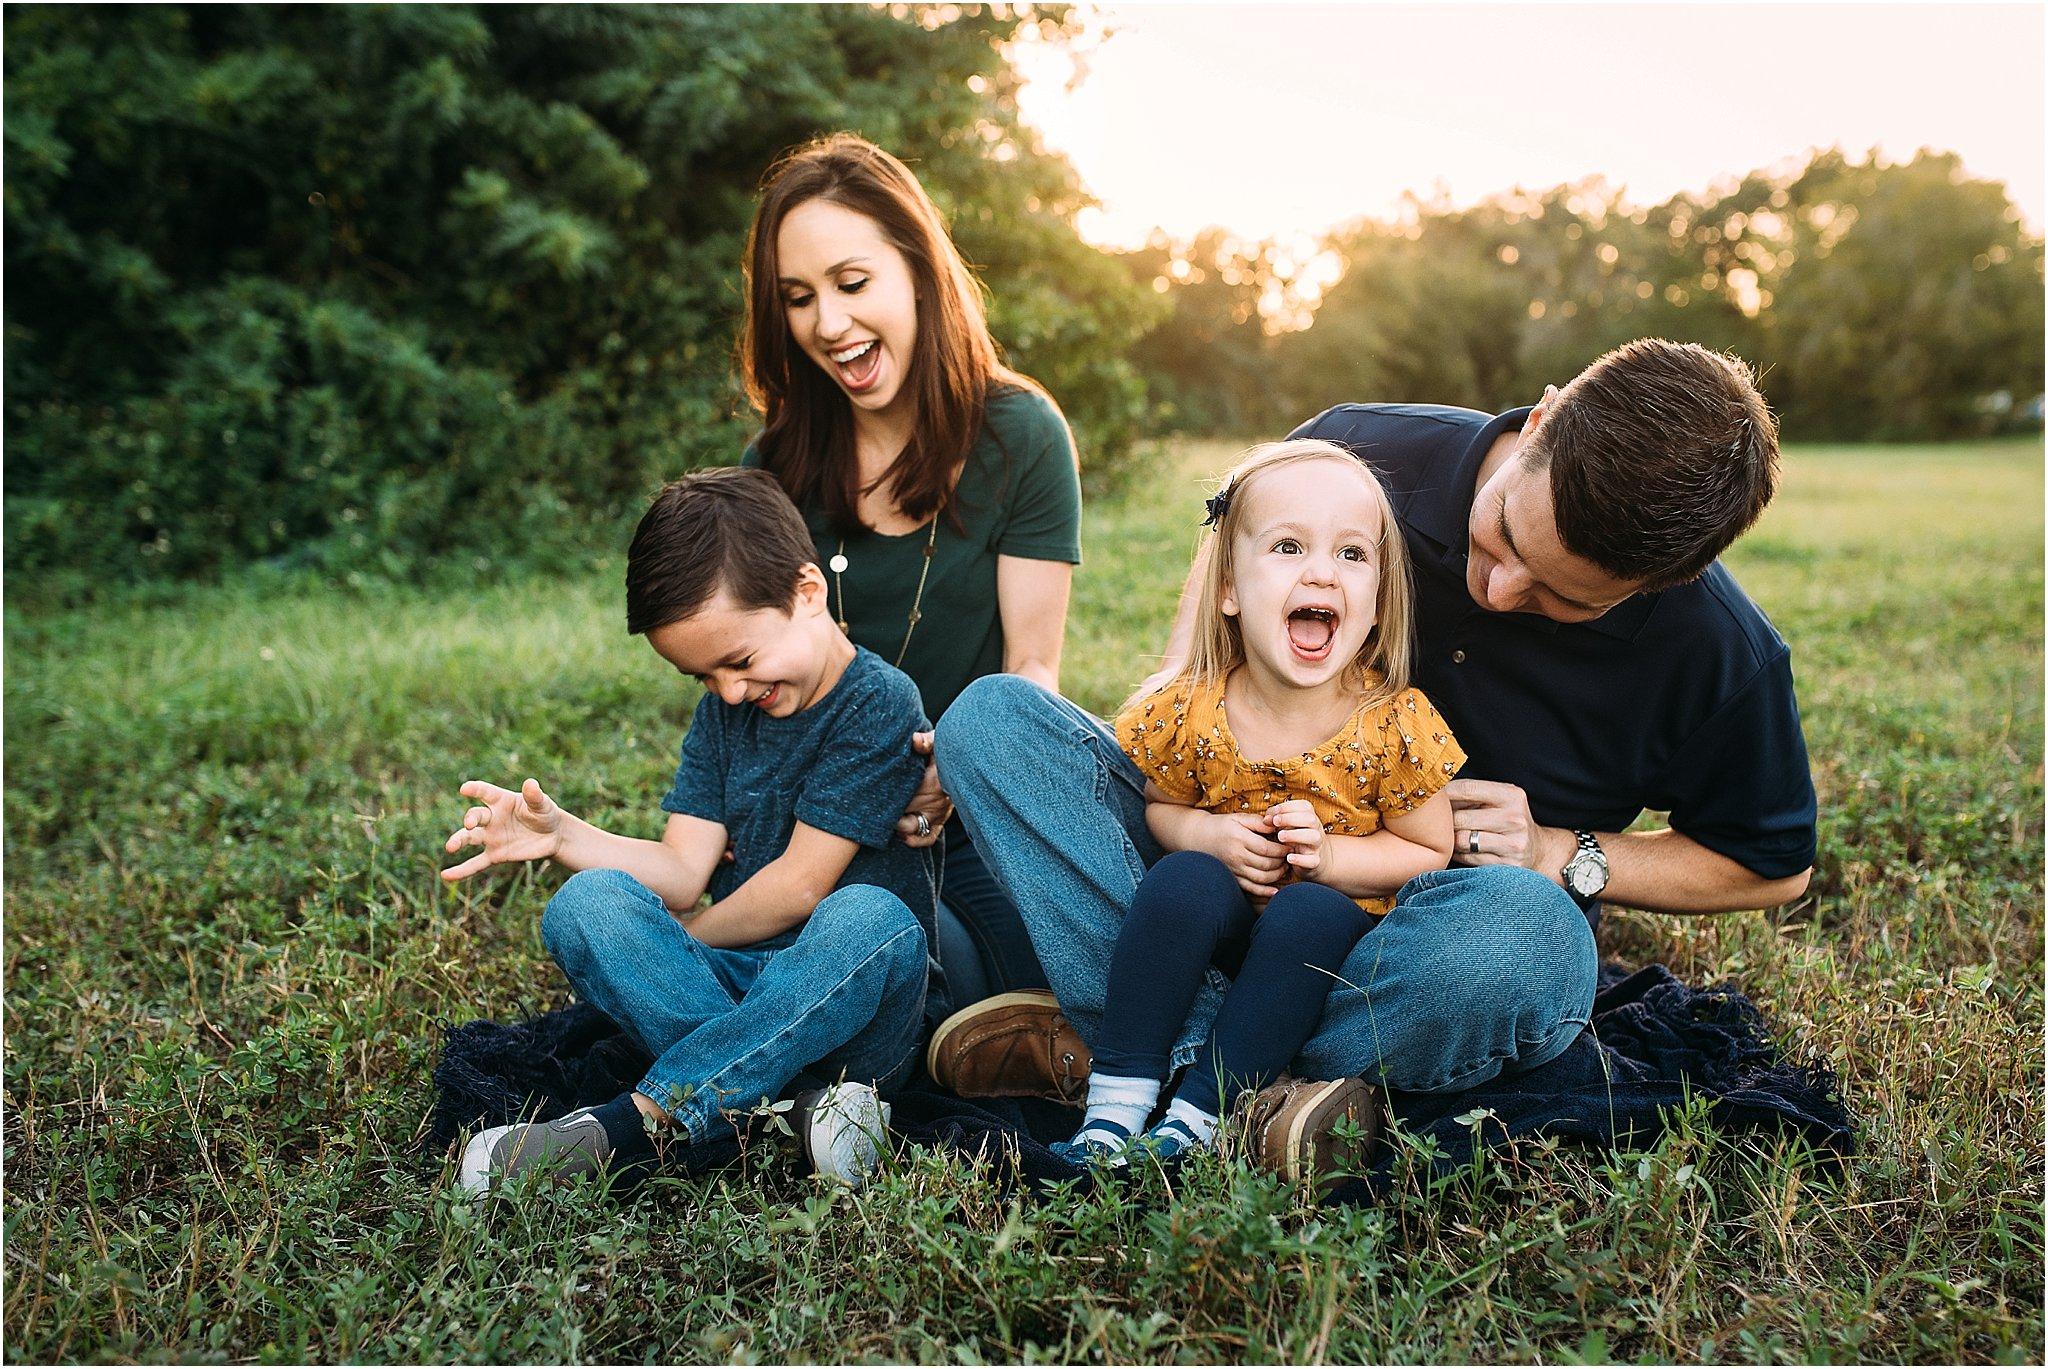 Ashley_Rogers_Photography_Orlando_Non-Posed_Newborn_Family_Lifestyle_Photographer_0643.jpg